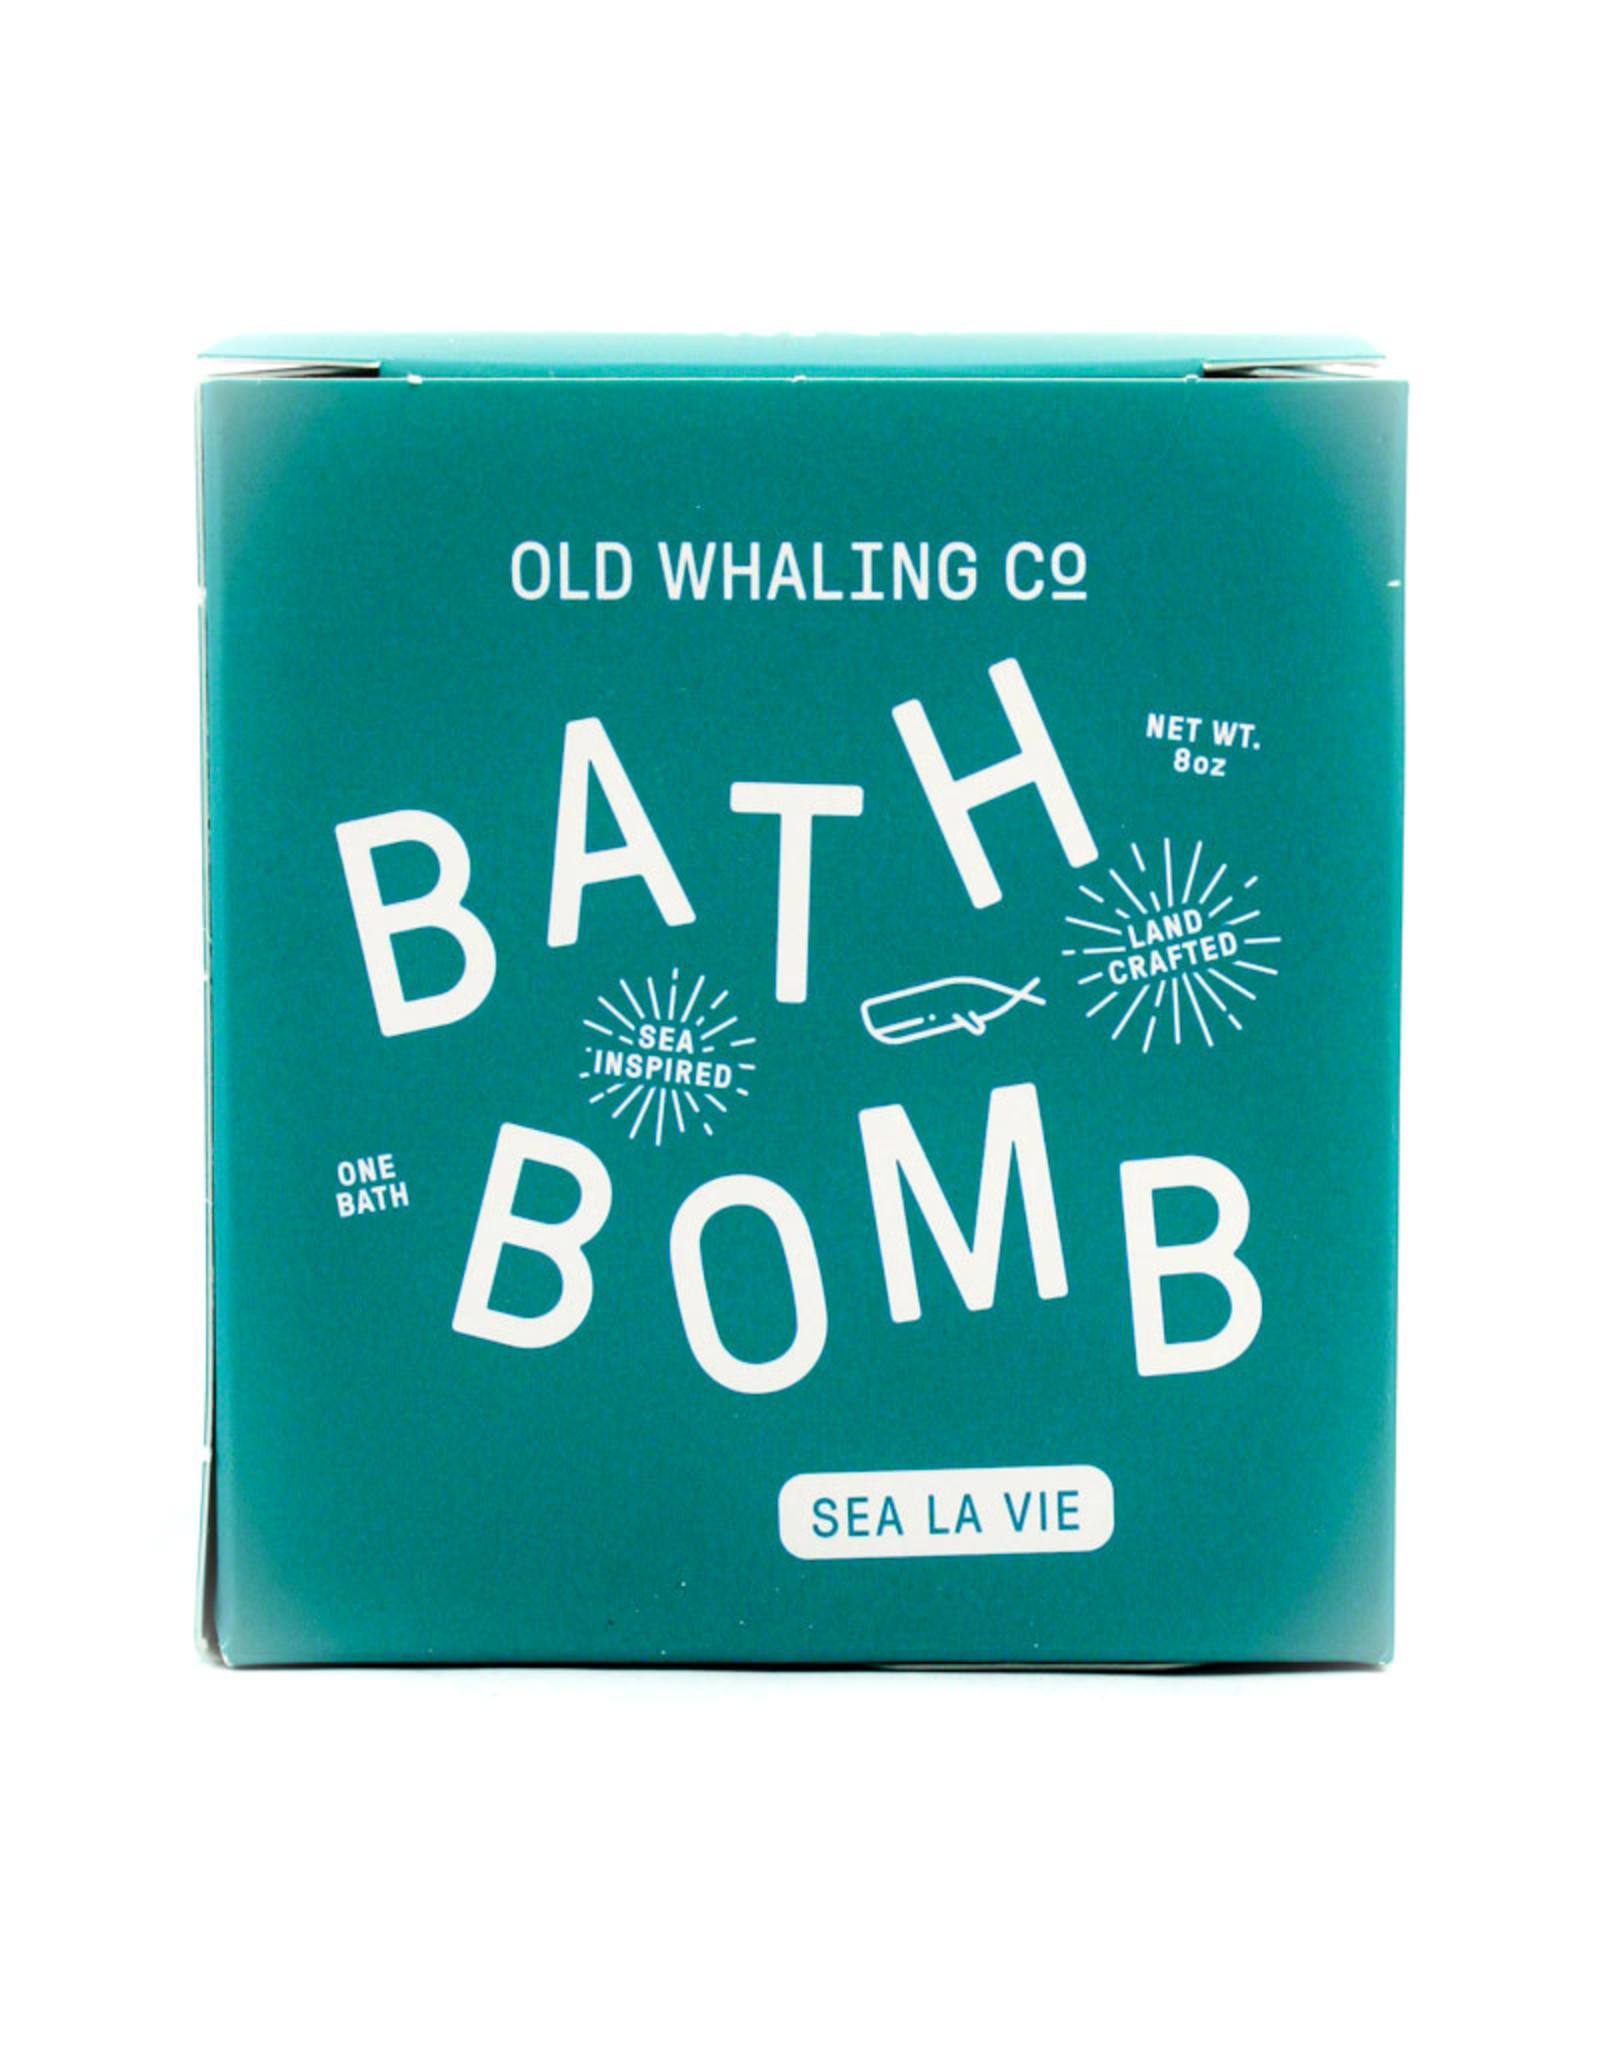 Old Whaling Company Sea La Vie Bath Bomb